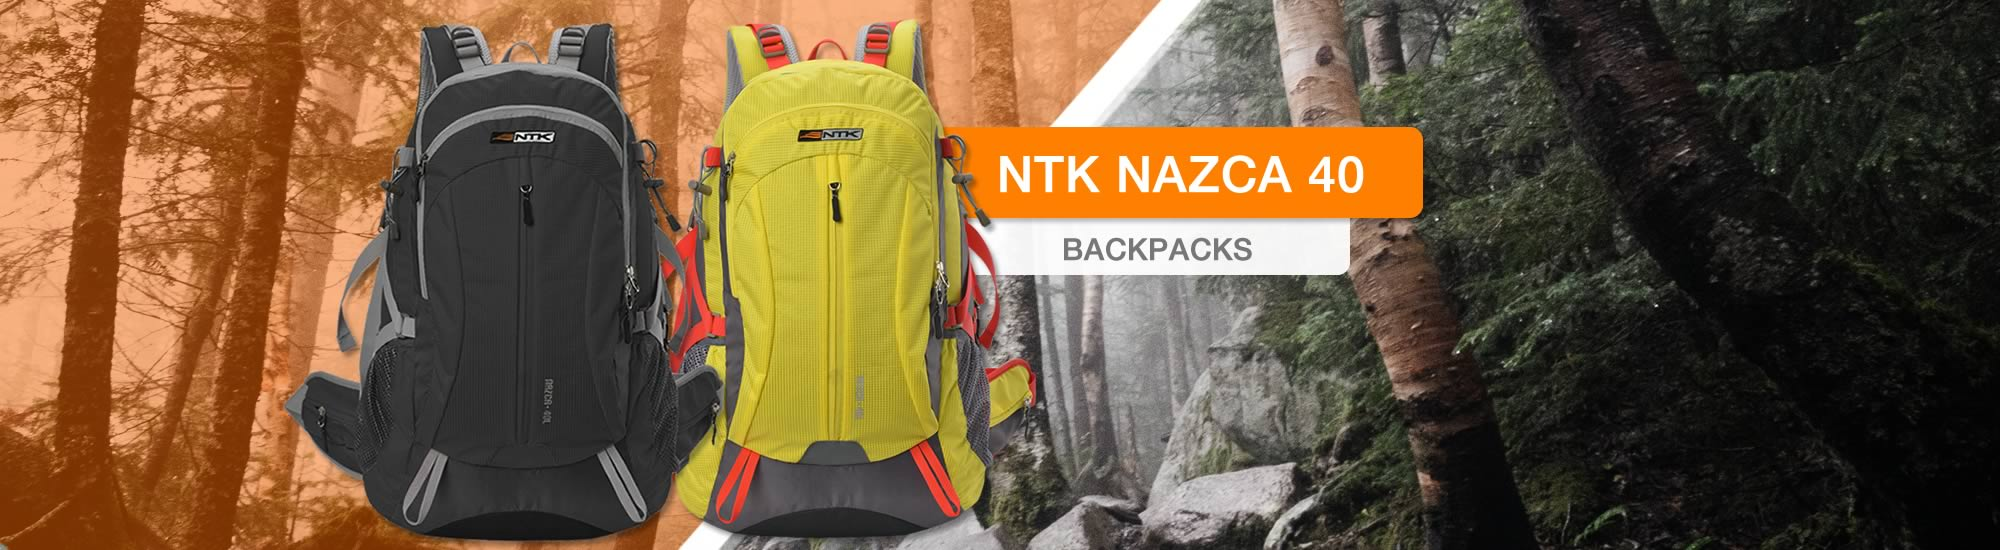 NTK Nazca 40 GT Backpack